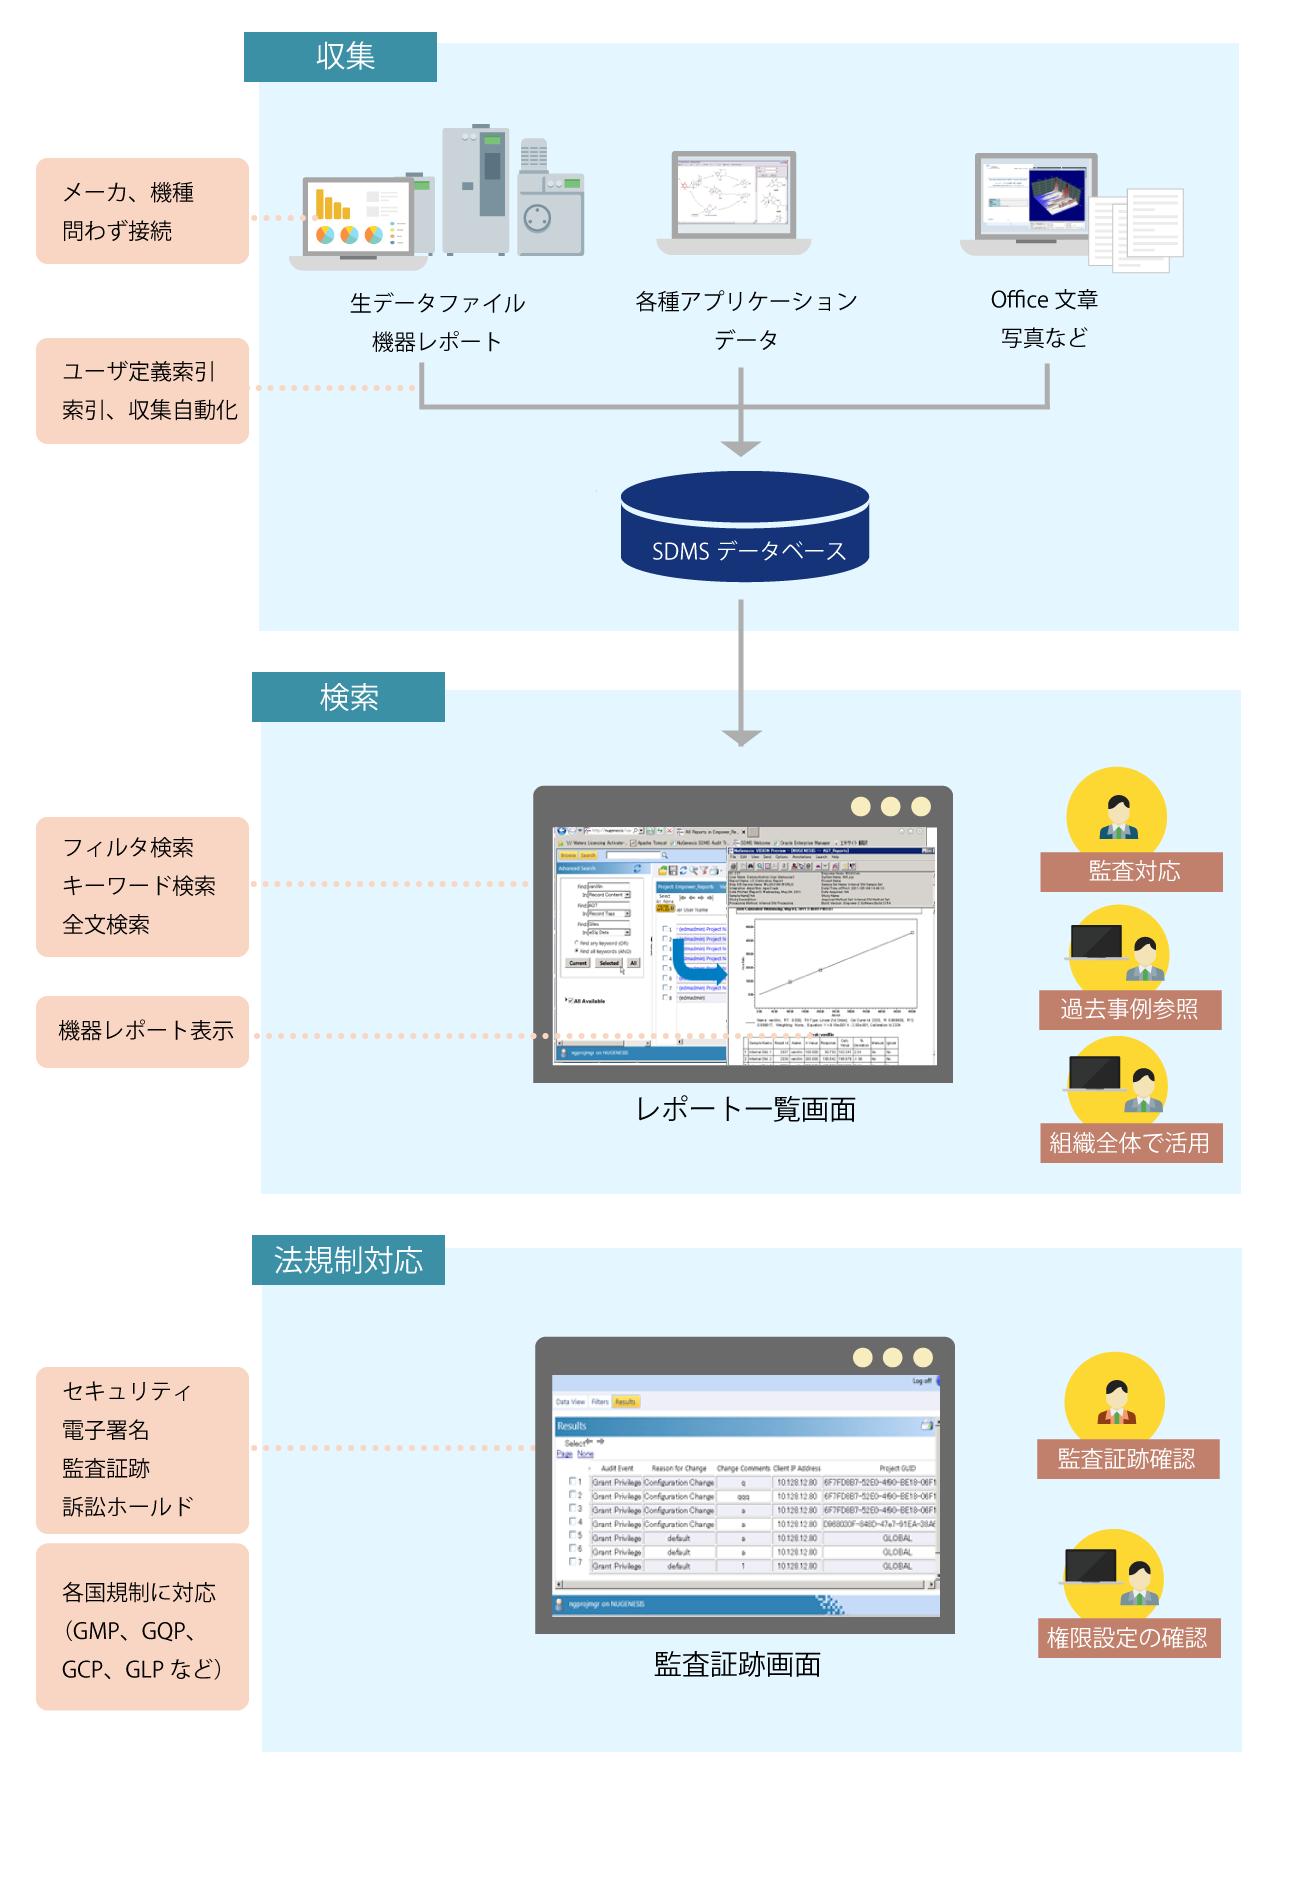 B-EN-Gが提供するデータインテグリティソリューション